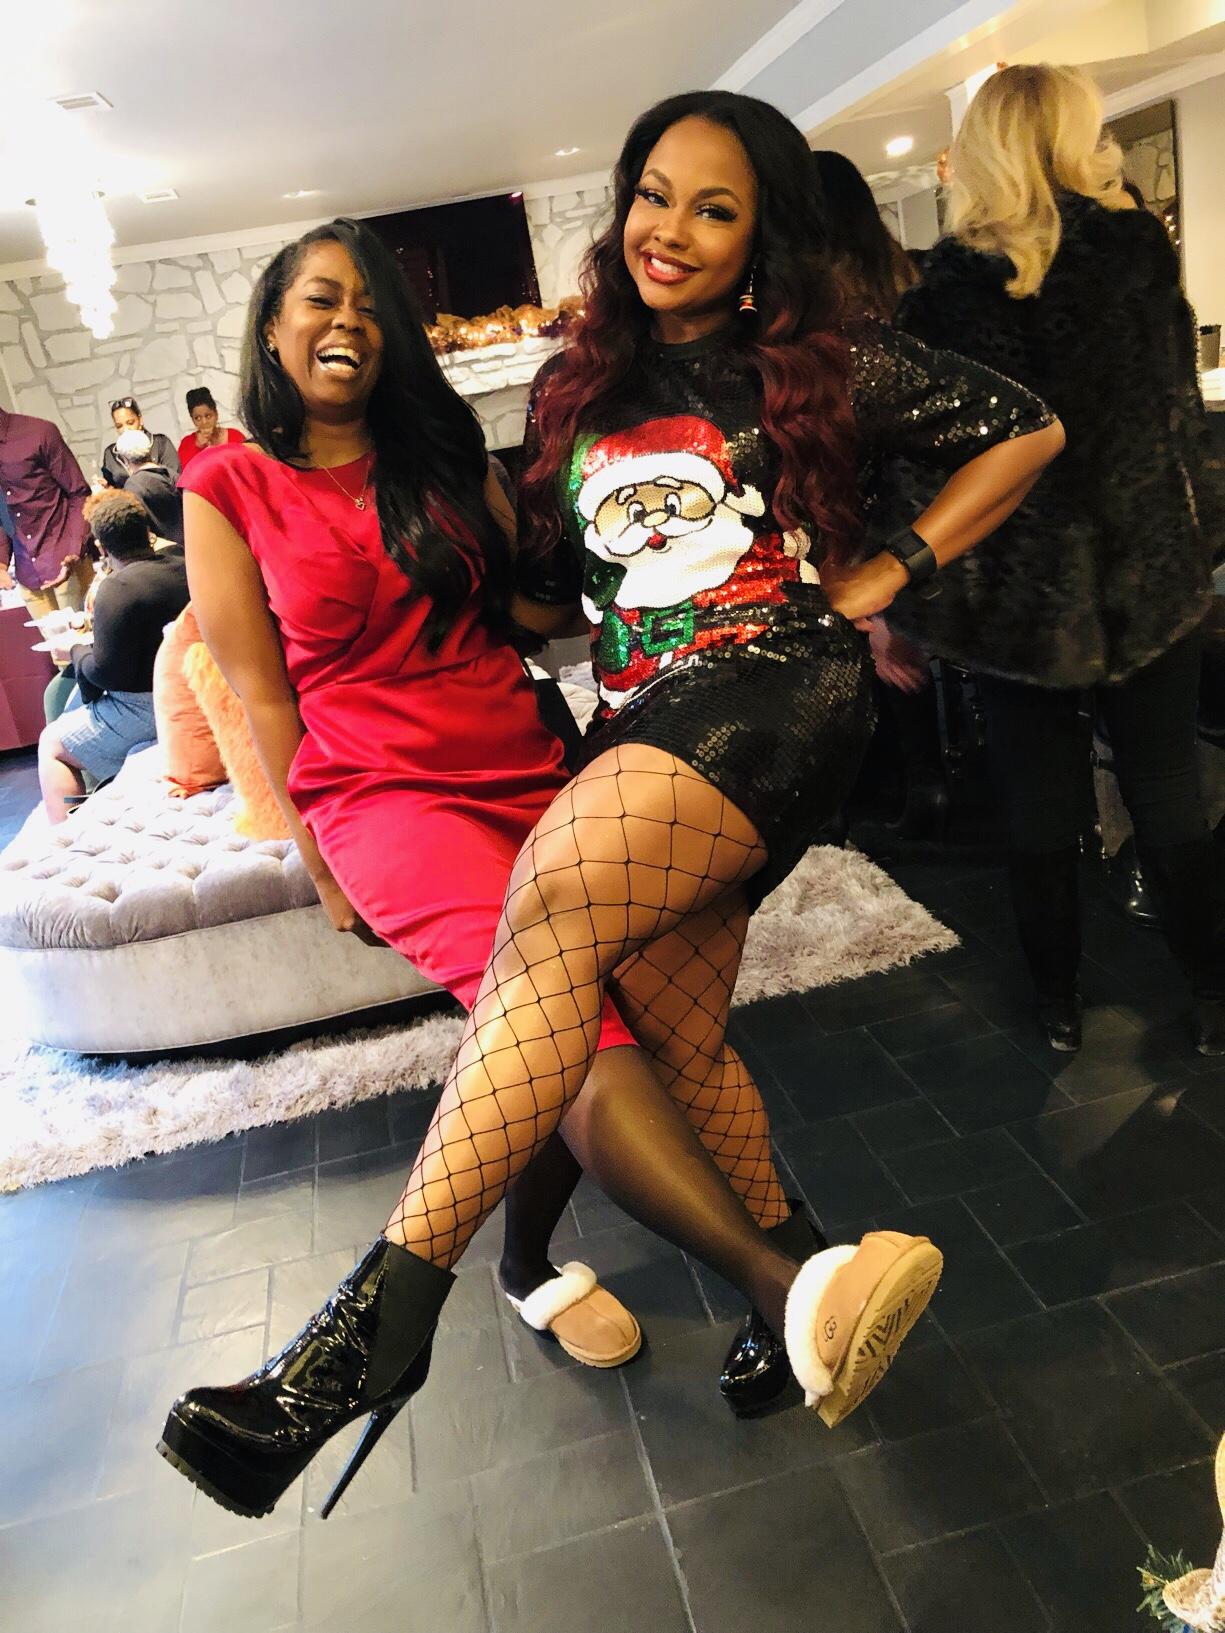 Phaedra Park's Holiday Girlfriends Gathering